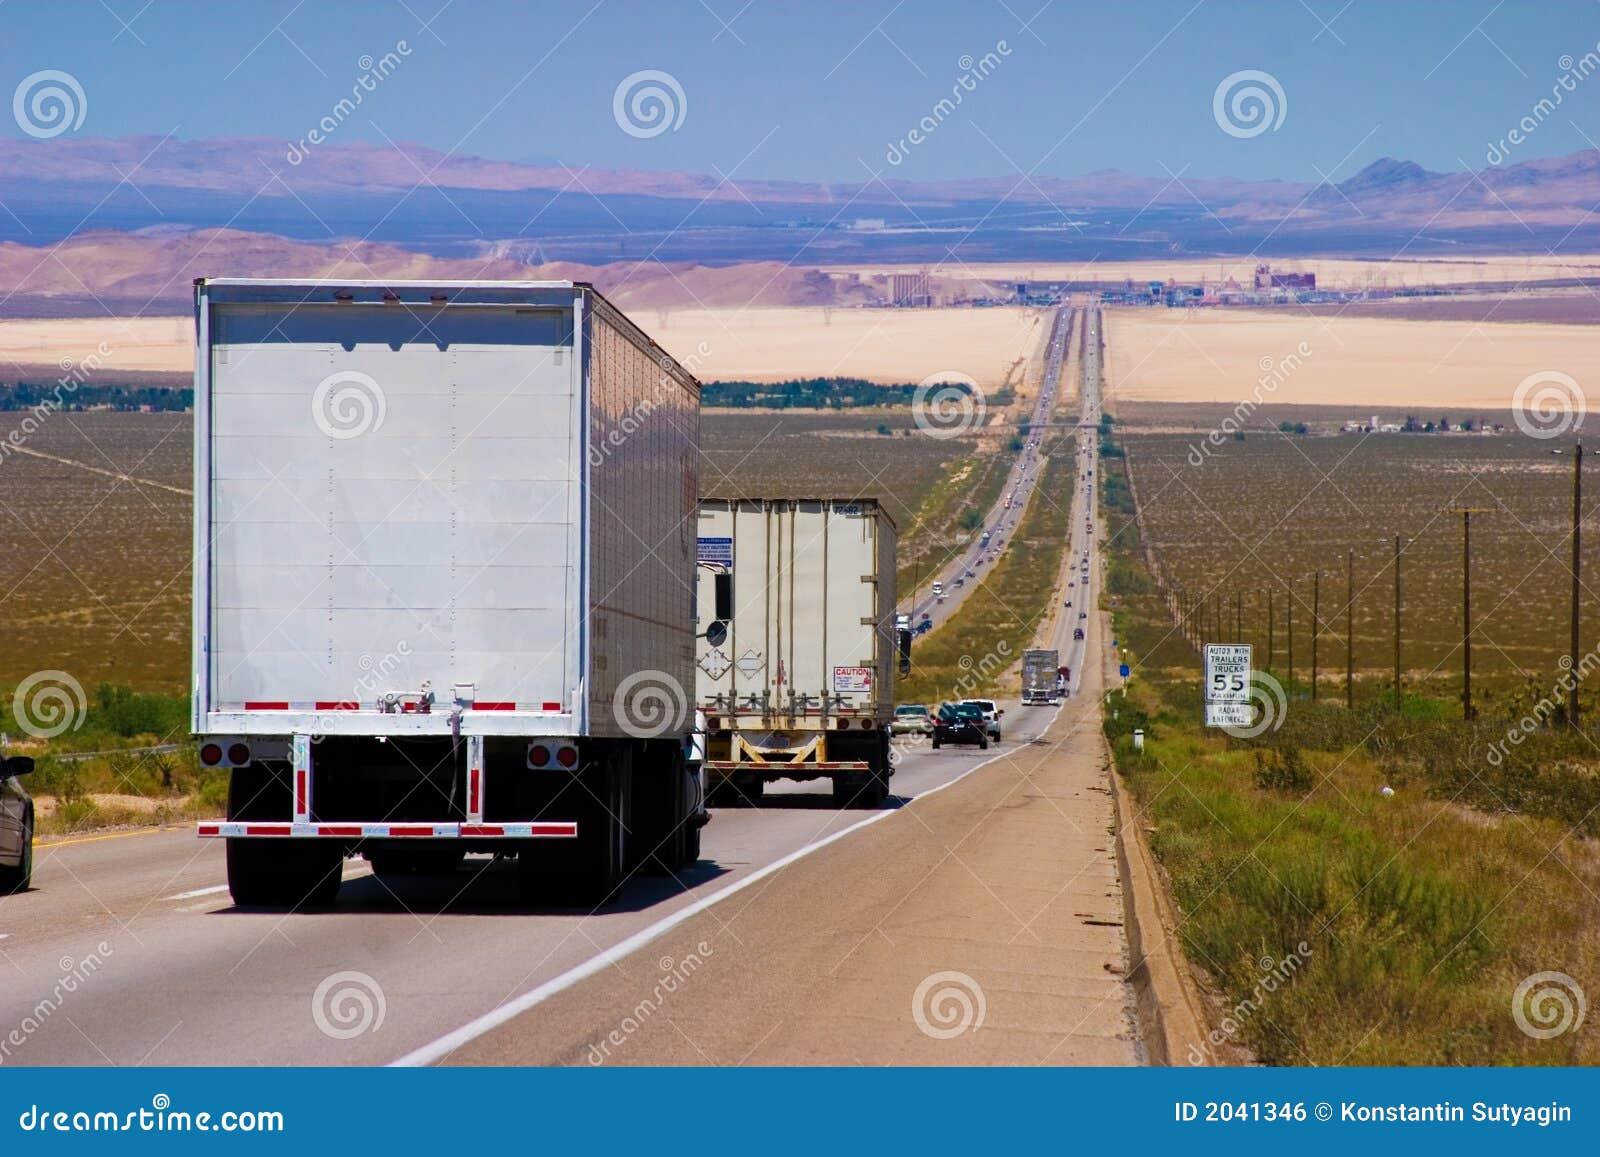 Delivery trucks highway